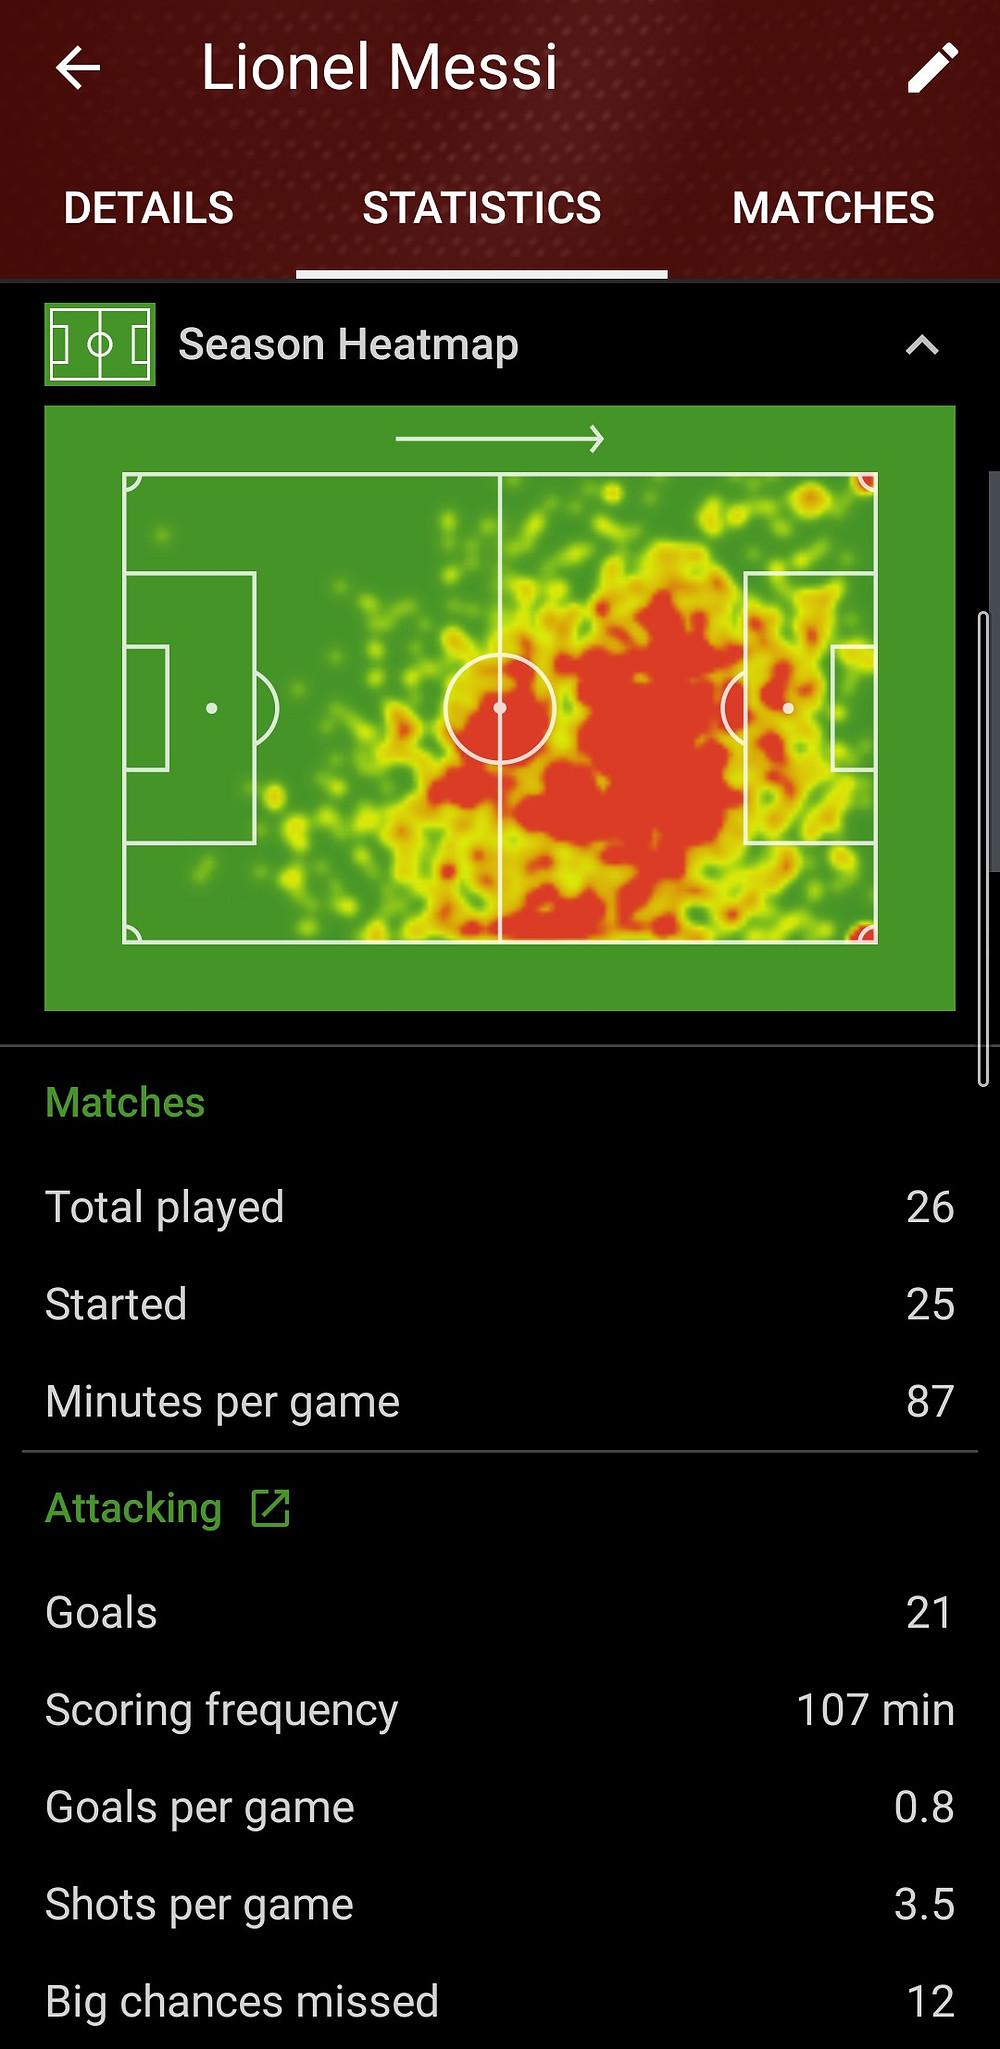 Lionel Messi 2019/ 20 Season SofaScore Heatmap